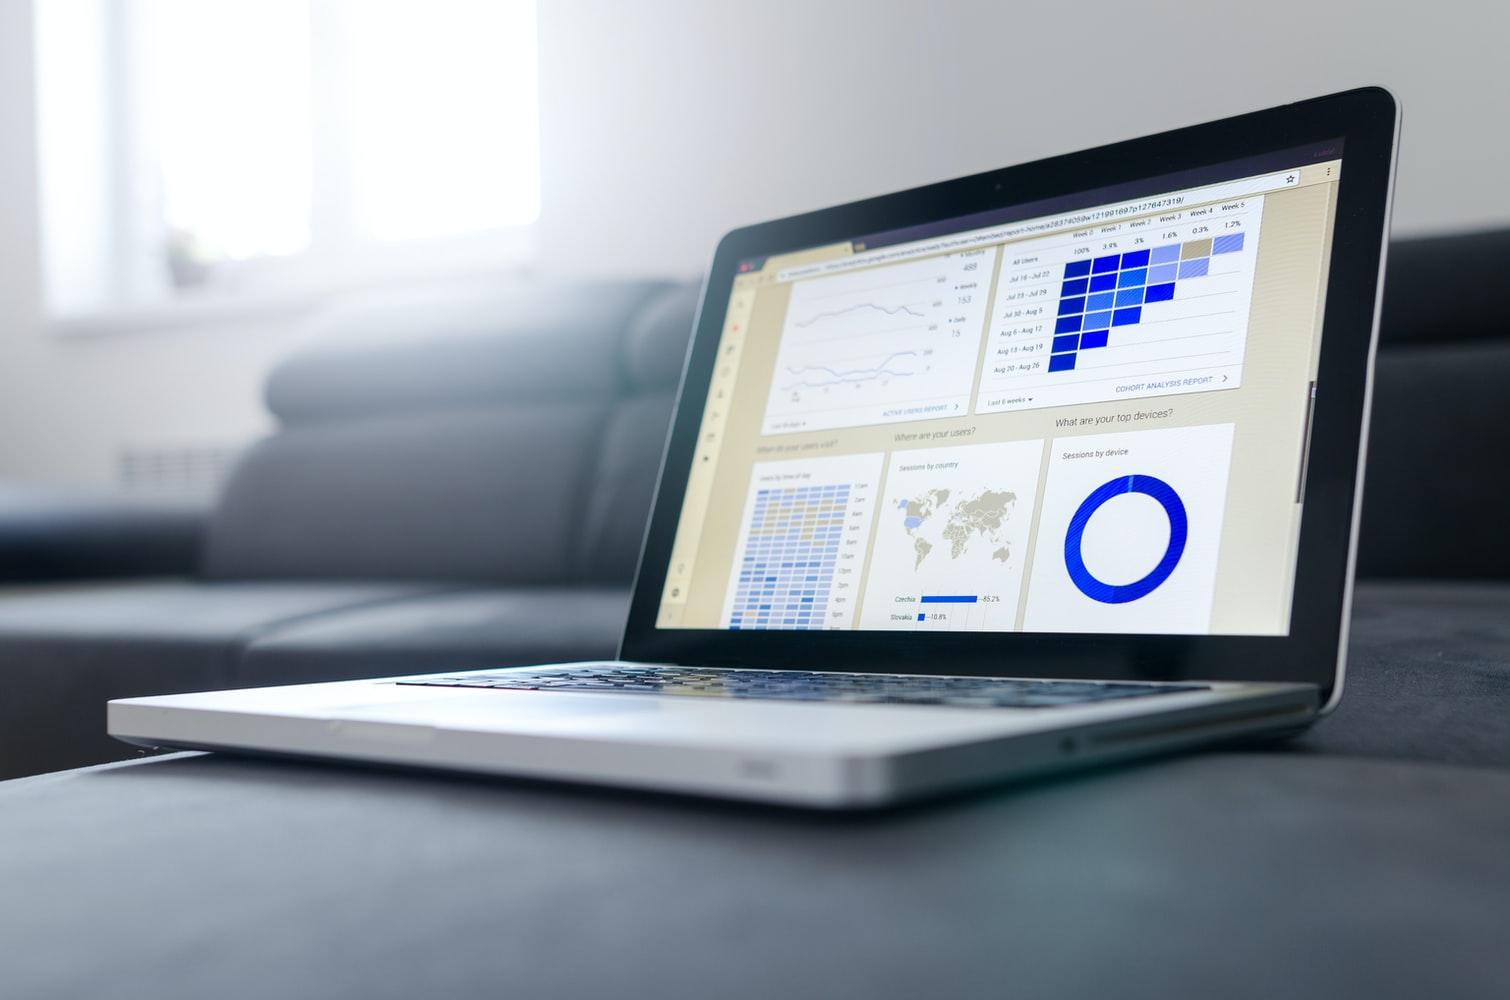 Compute with SEO metrics on screen